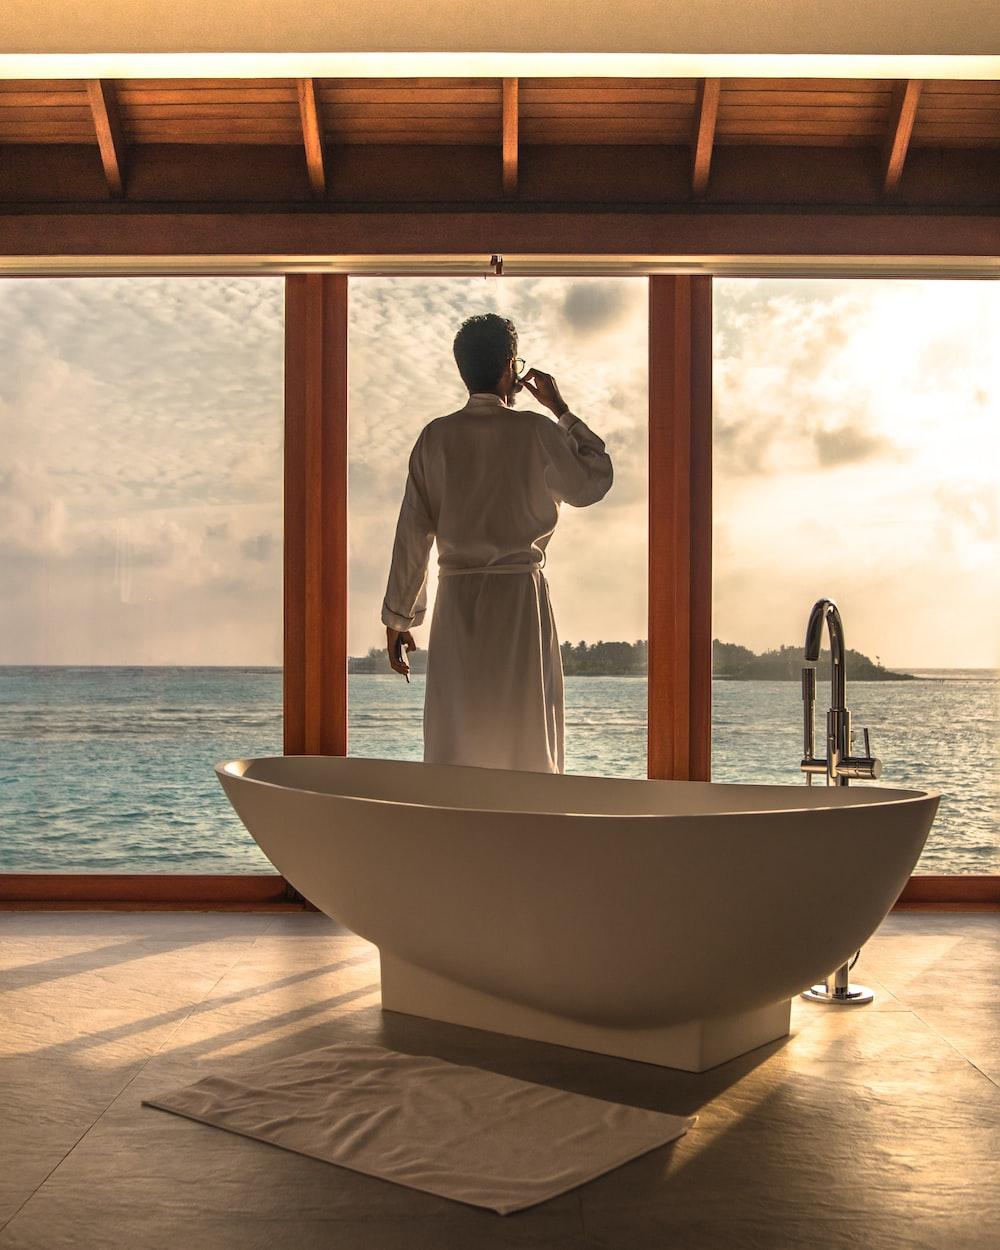 man standing beside bathtub